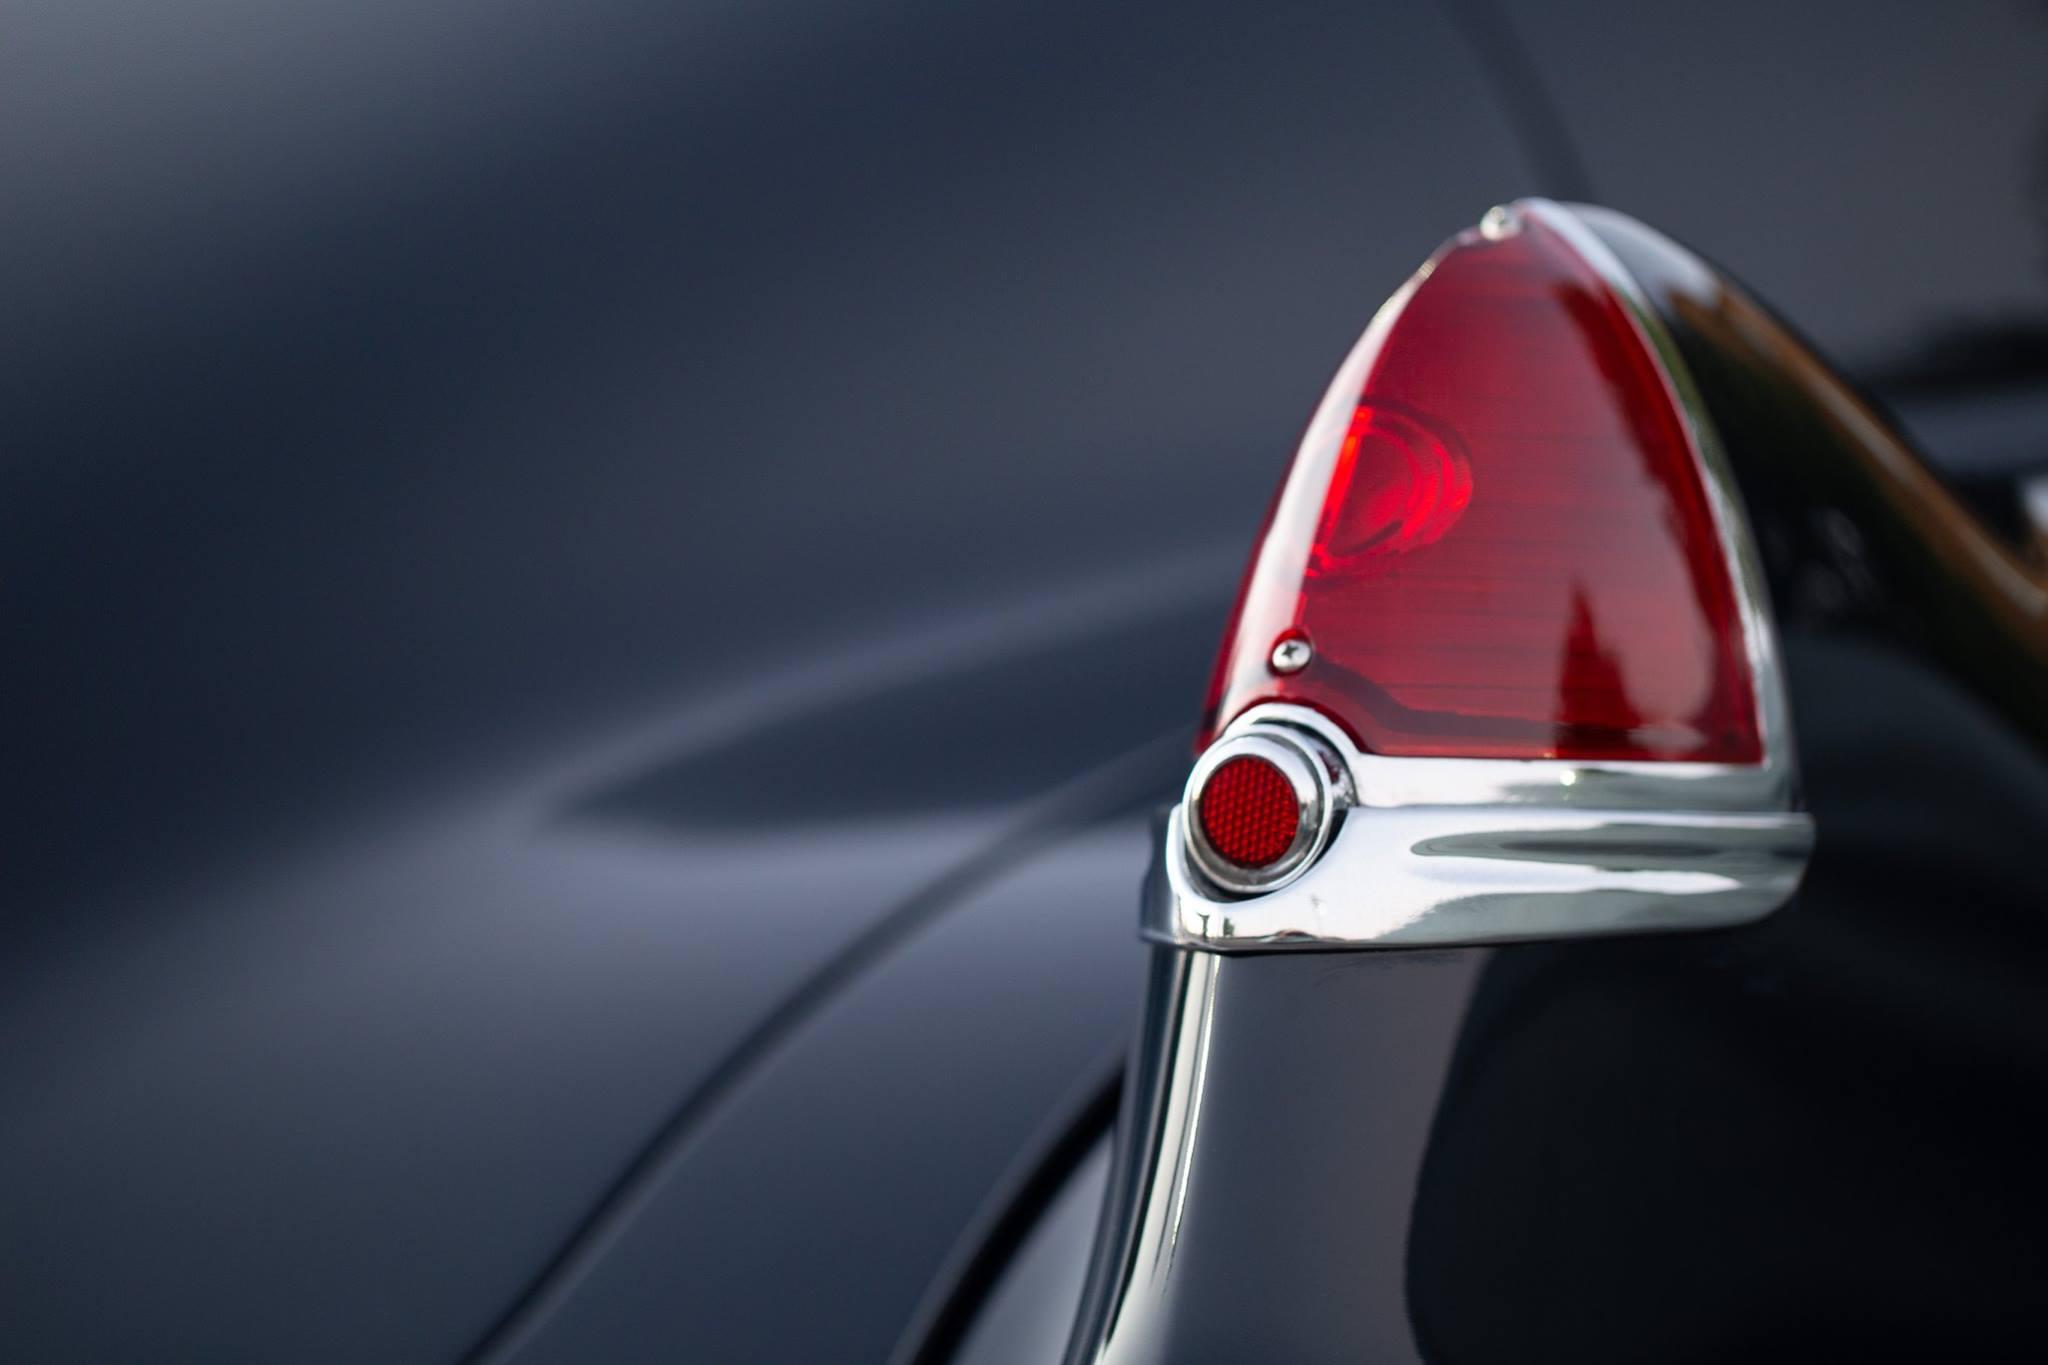 ART - Cadillac Sedanette